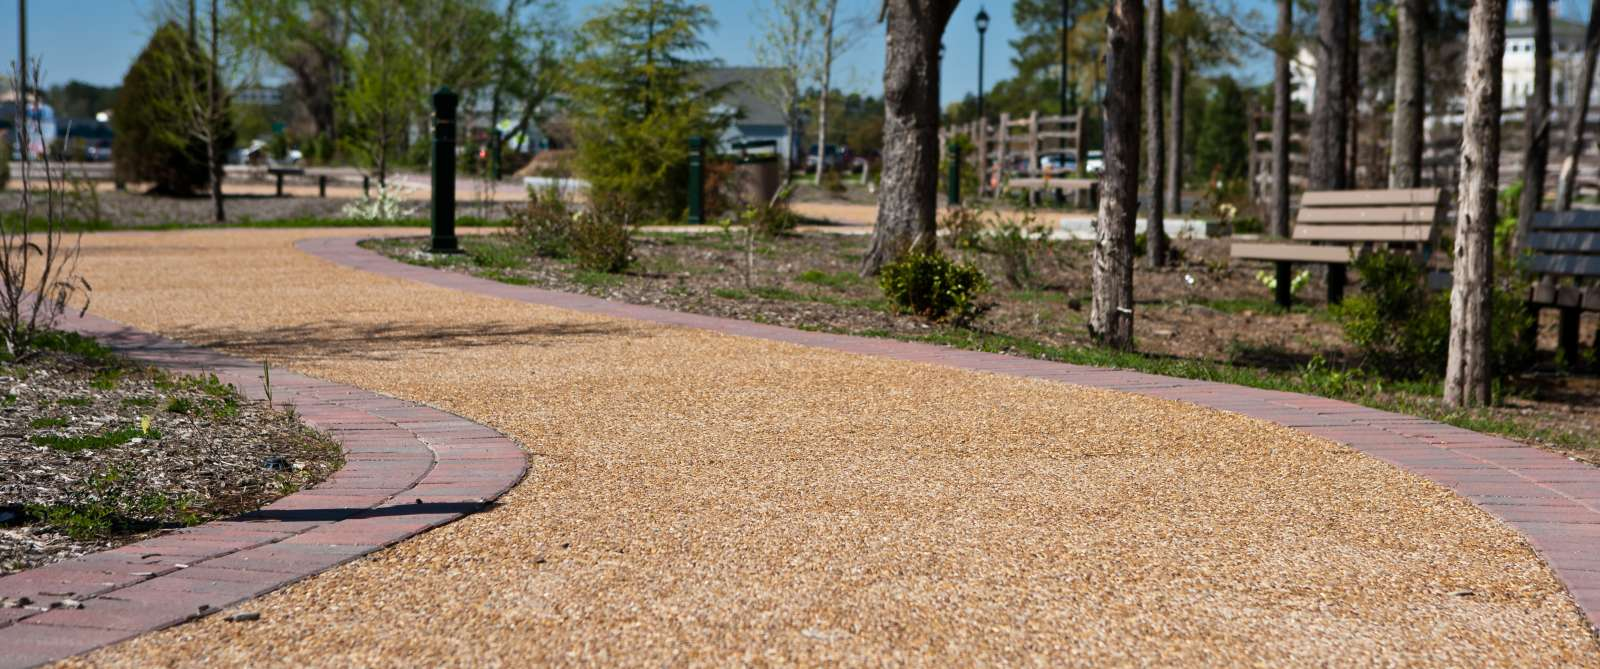 Brick-lined Interpretive Trail at Battlefield Park in Chesapeake, VA